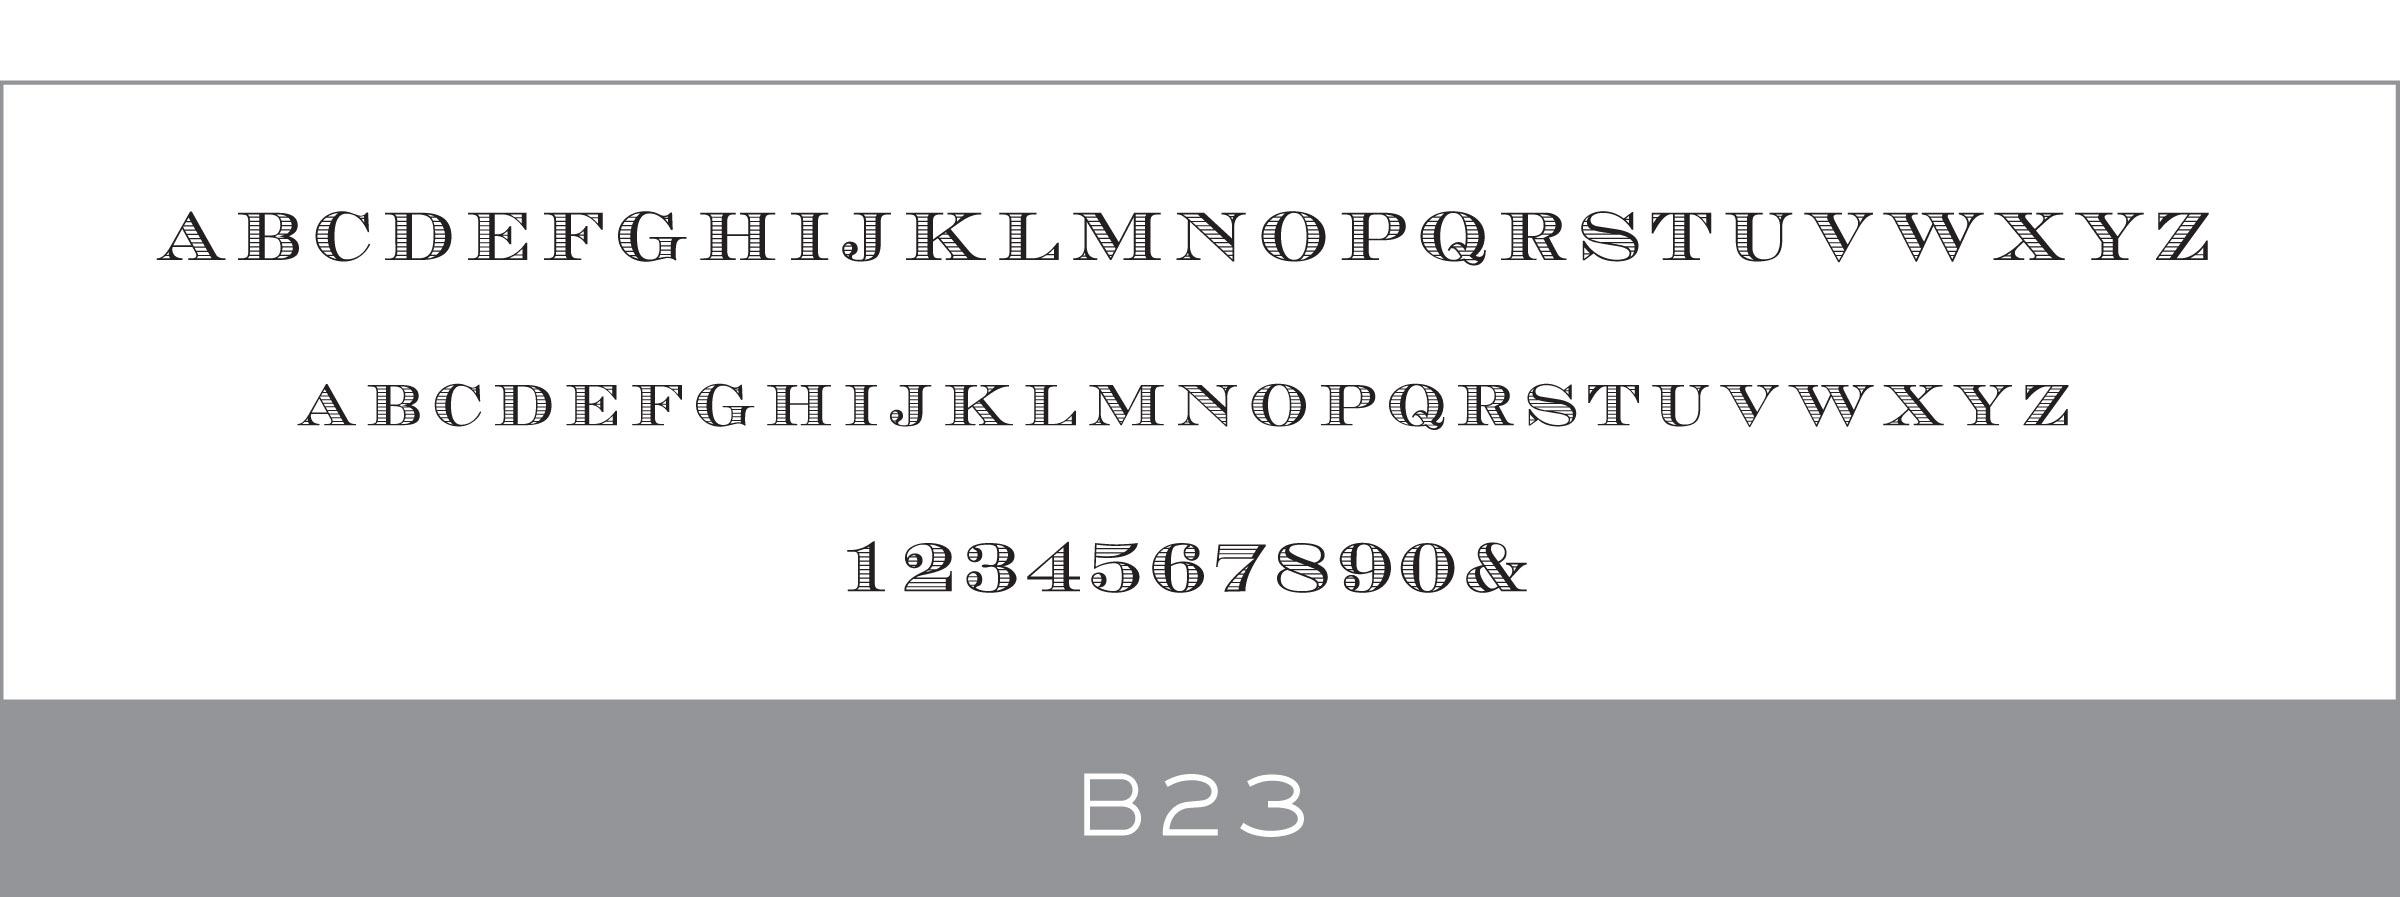 B23_Haute_Papier_Font.jpg